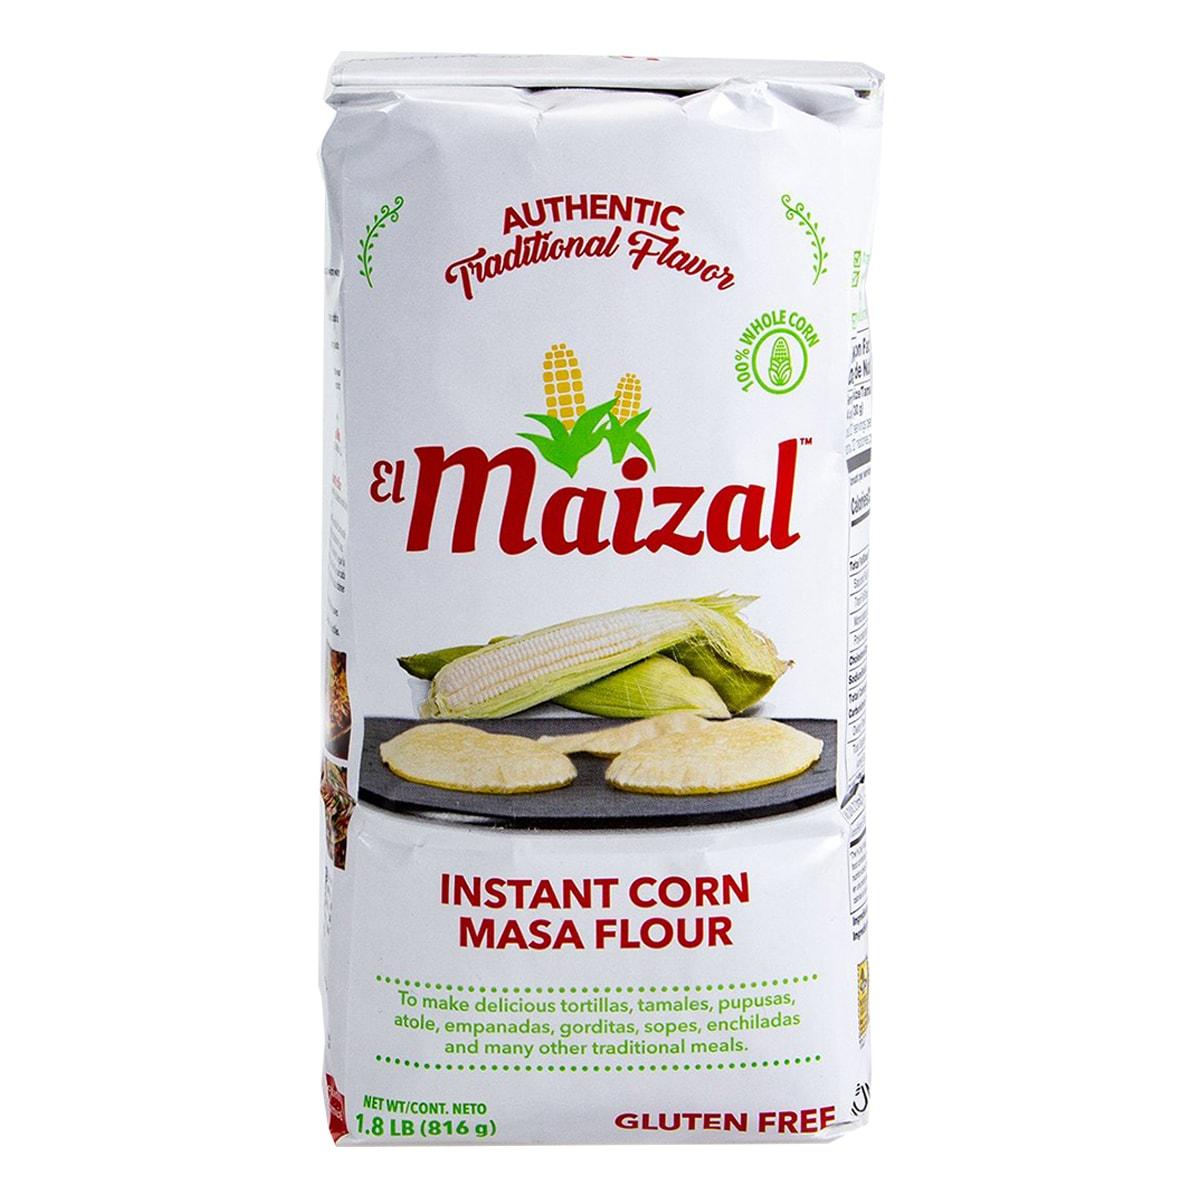 Buy EL Maizal Nixtamalized White Corn Masa Mix - 816 gm